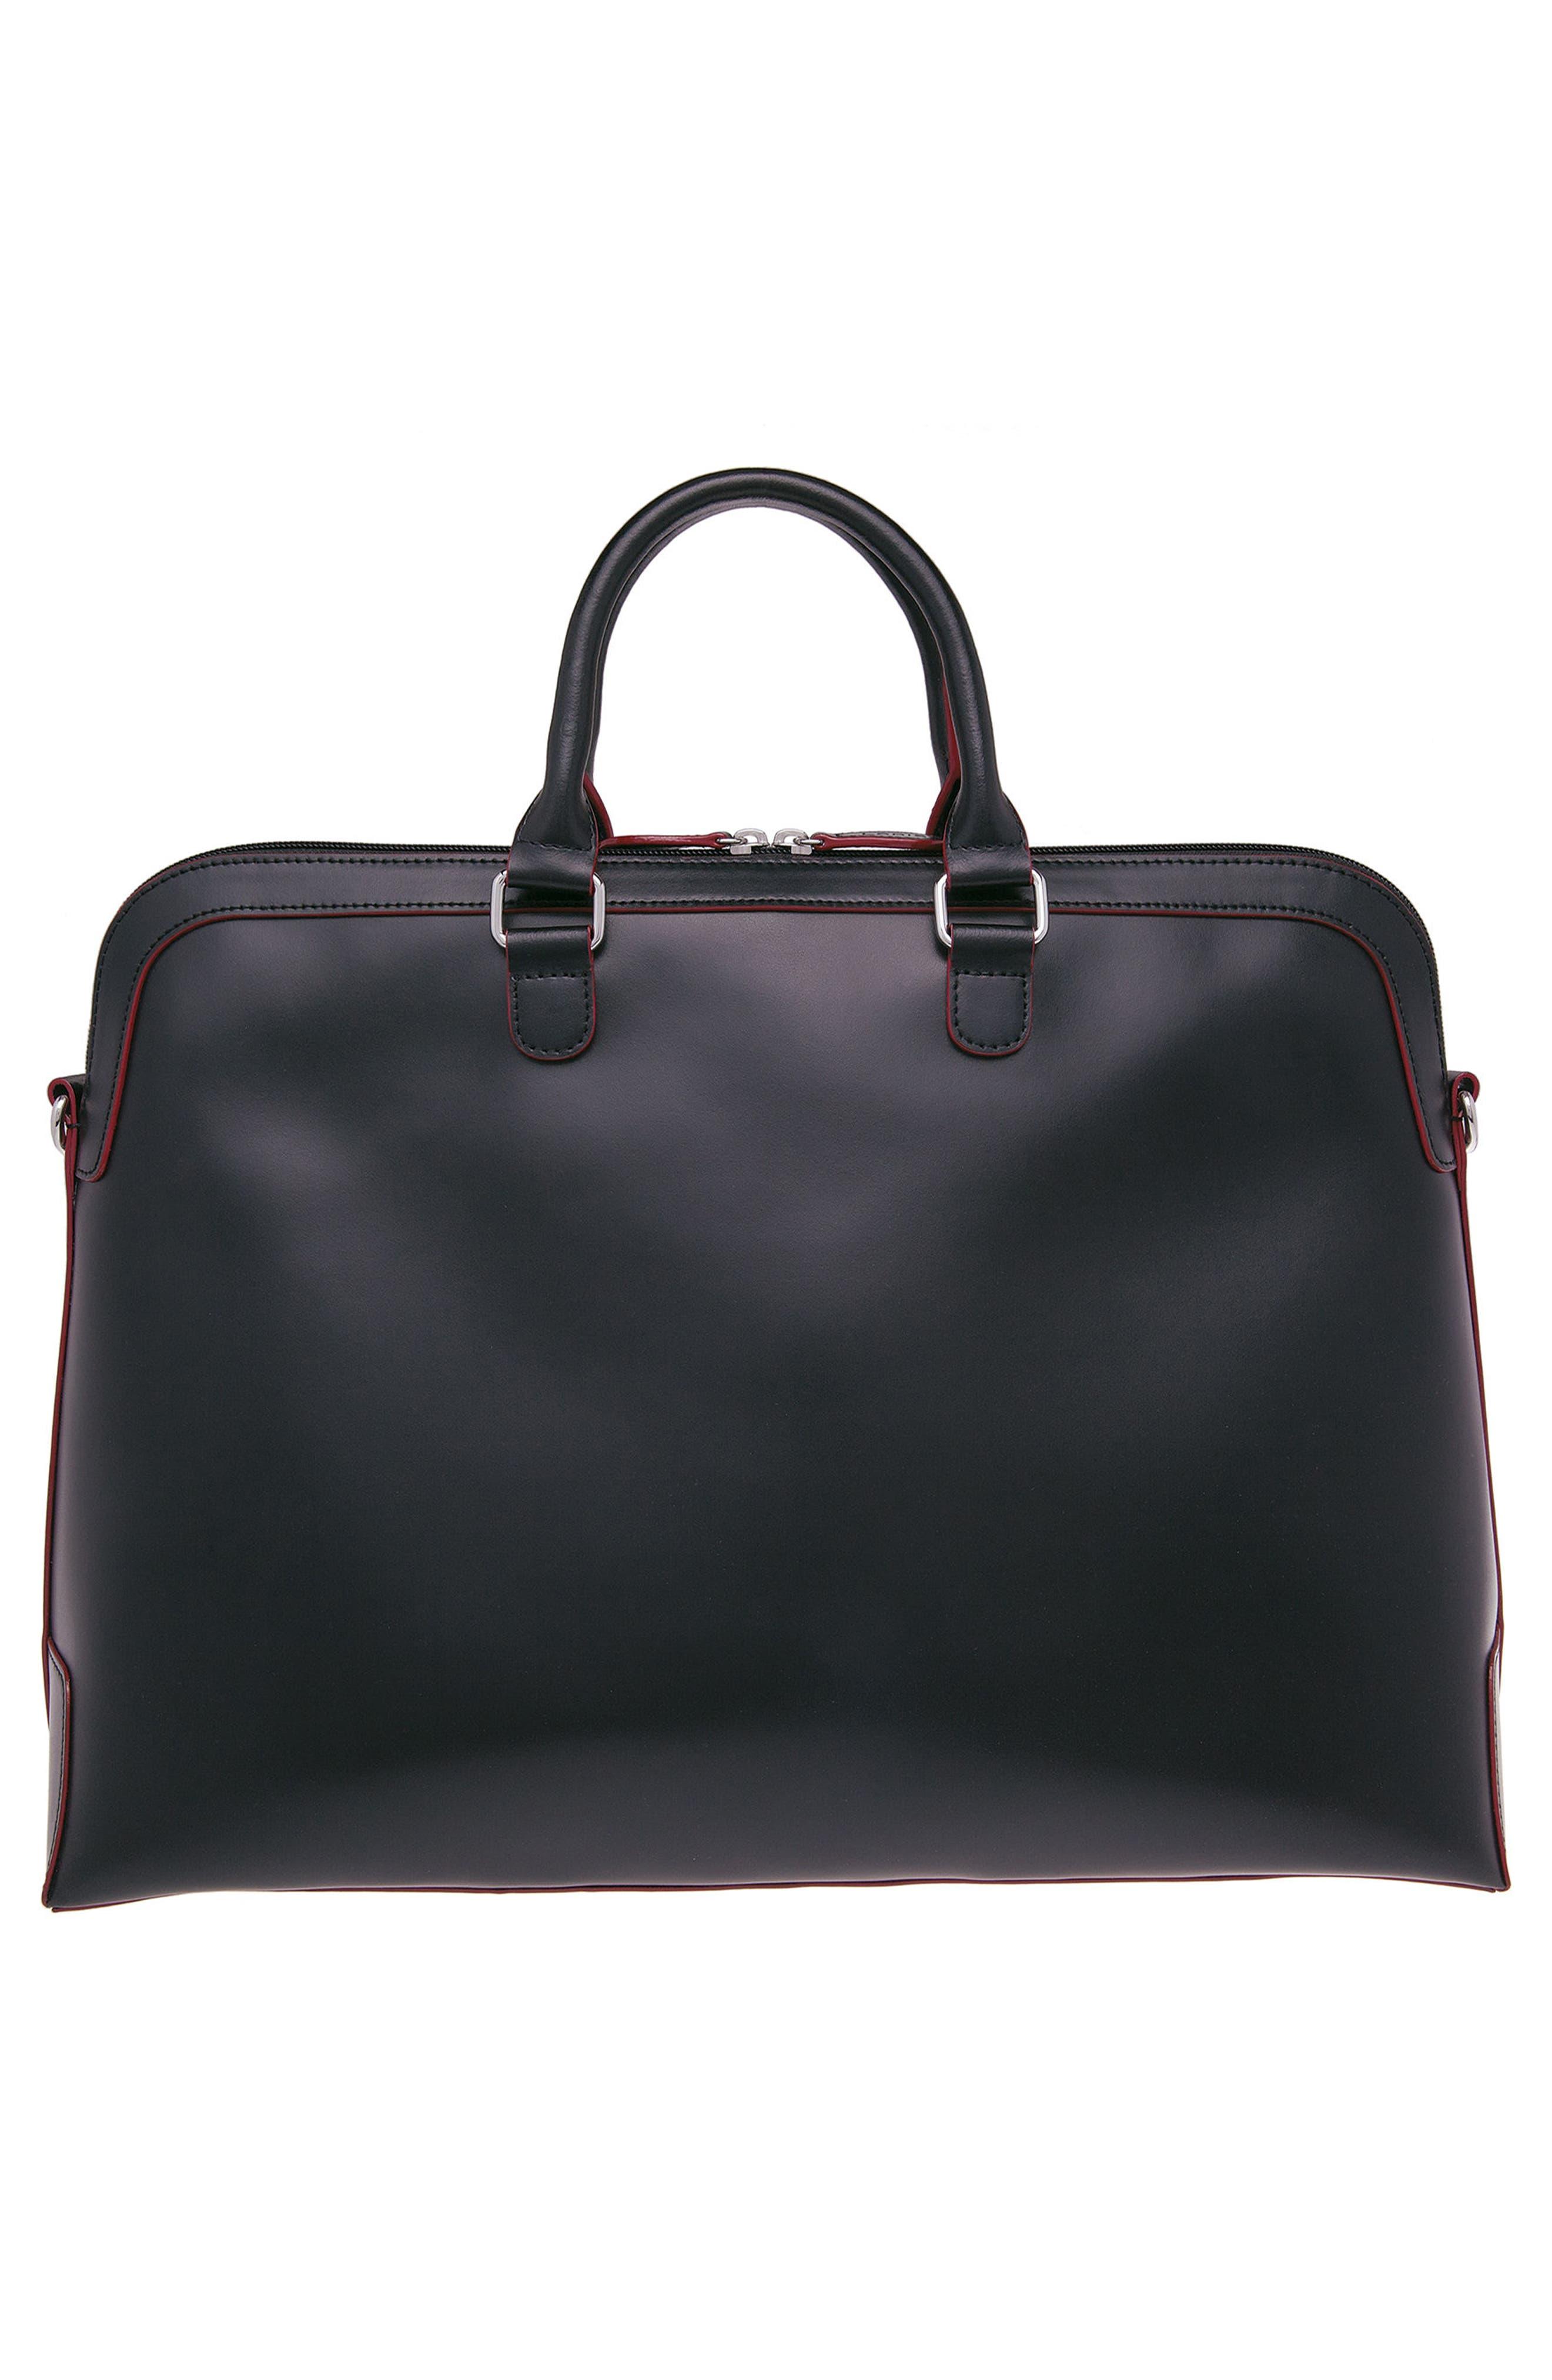 Lodis 'Audrey Brera' Leather Briefcase,                             Alternate thumbnail 2, color,                             001